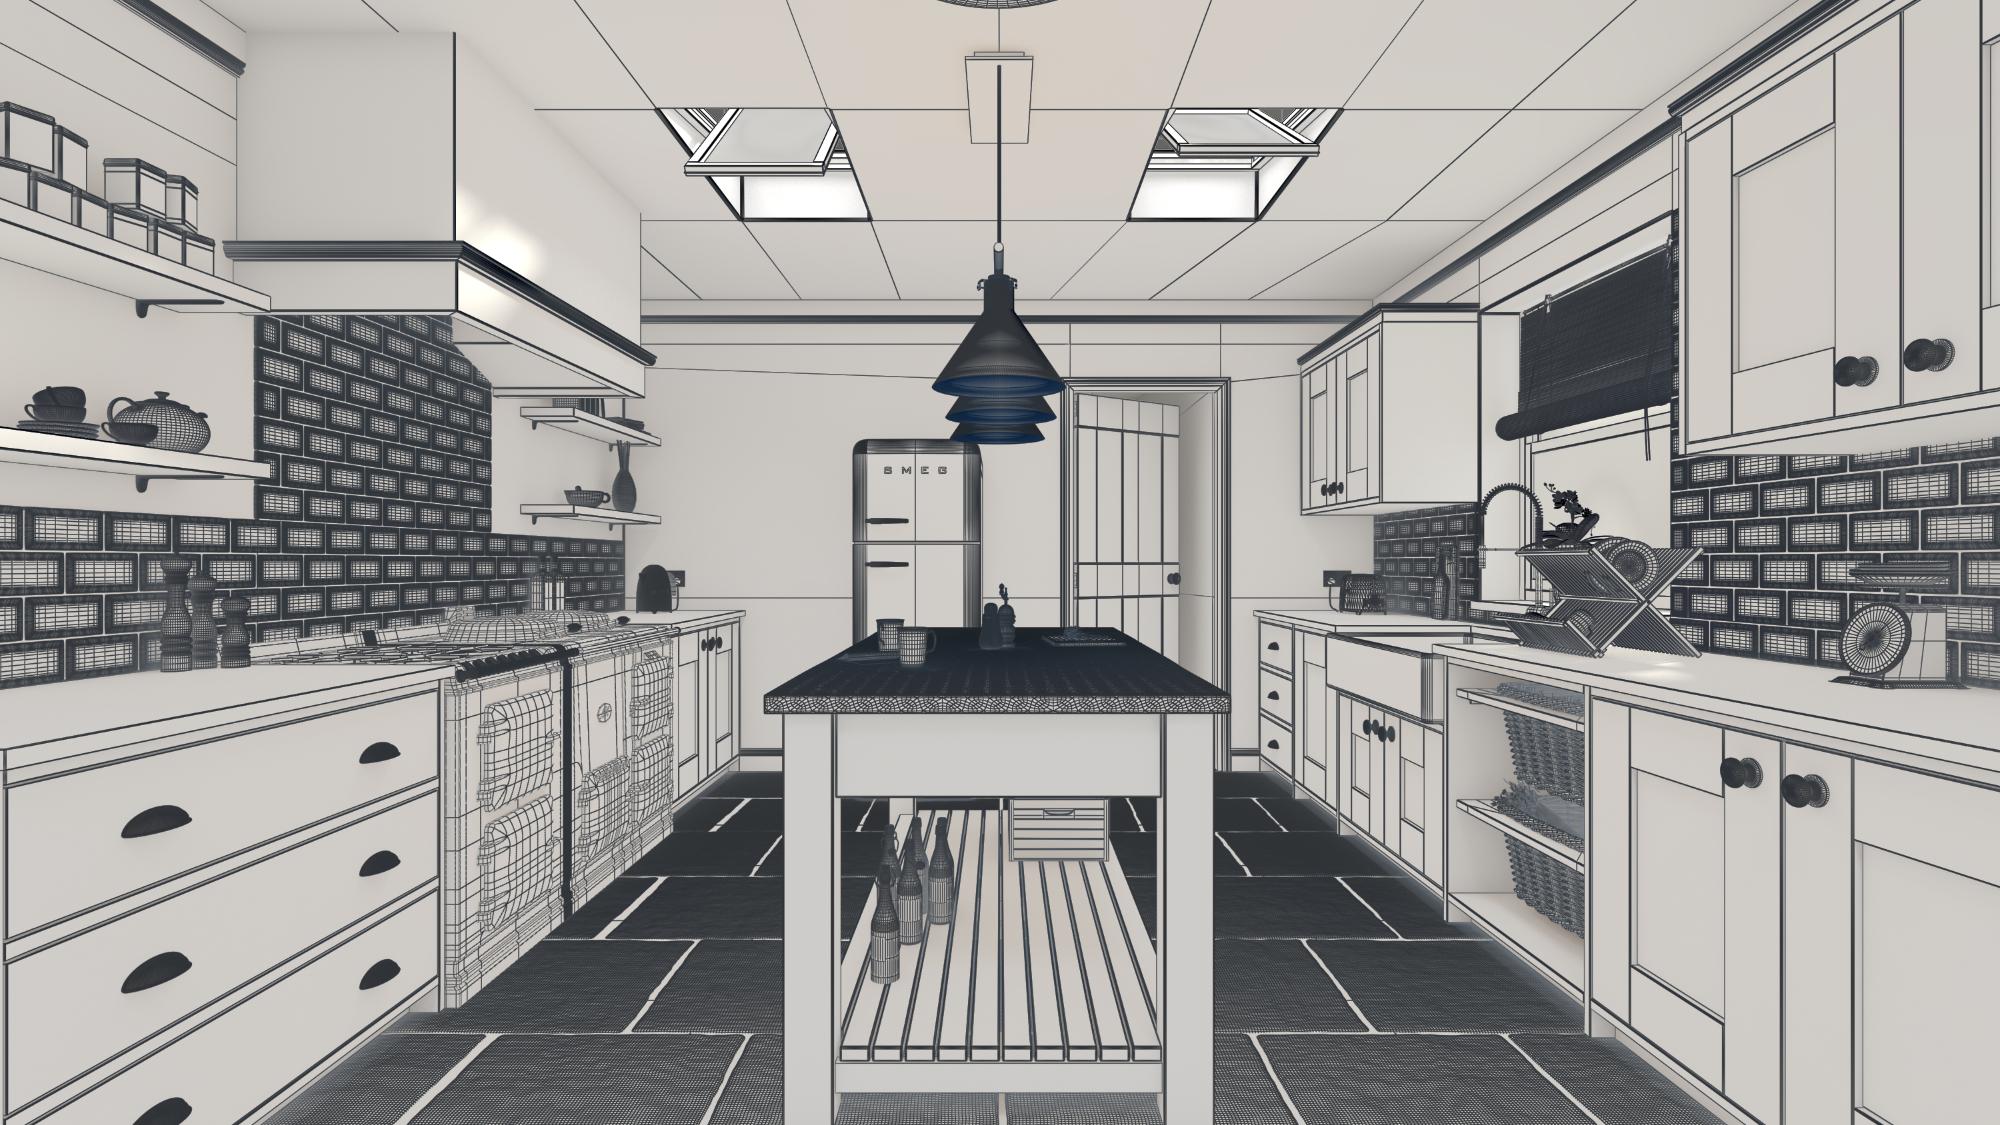 Fractal CG , CGI Visualisation, 3D Render, Interior, Architecture, Farm House Kitchen